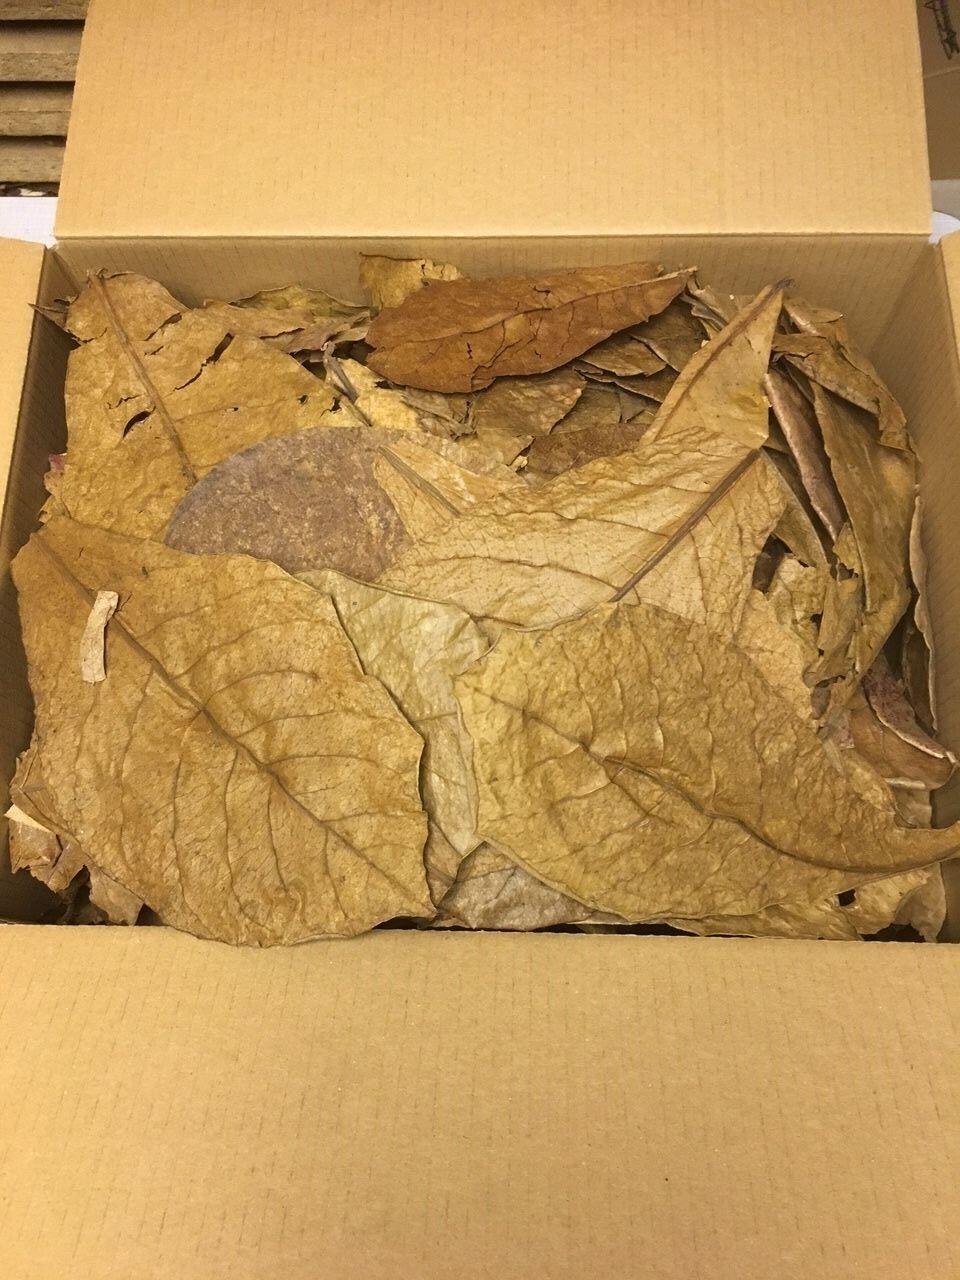 Hojas del almendro MALABAR 0,5kg unsortierte Mercancía B CATAPPA leaves